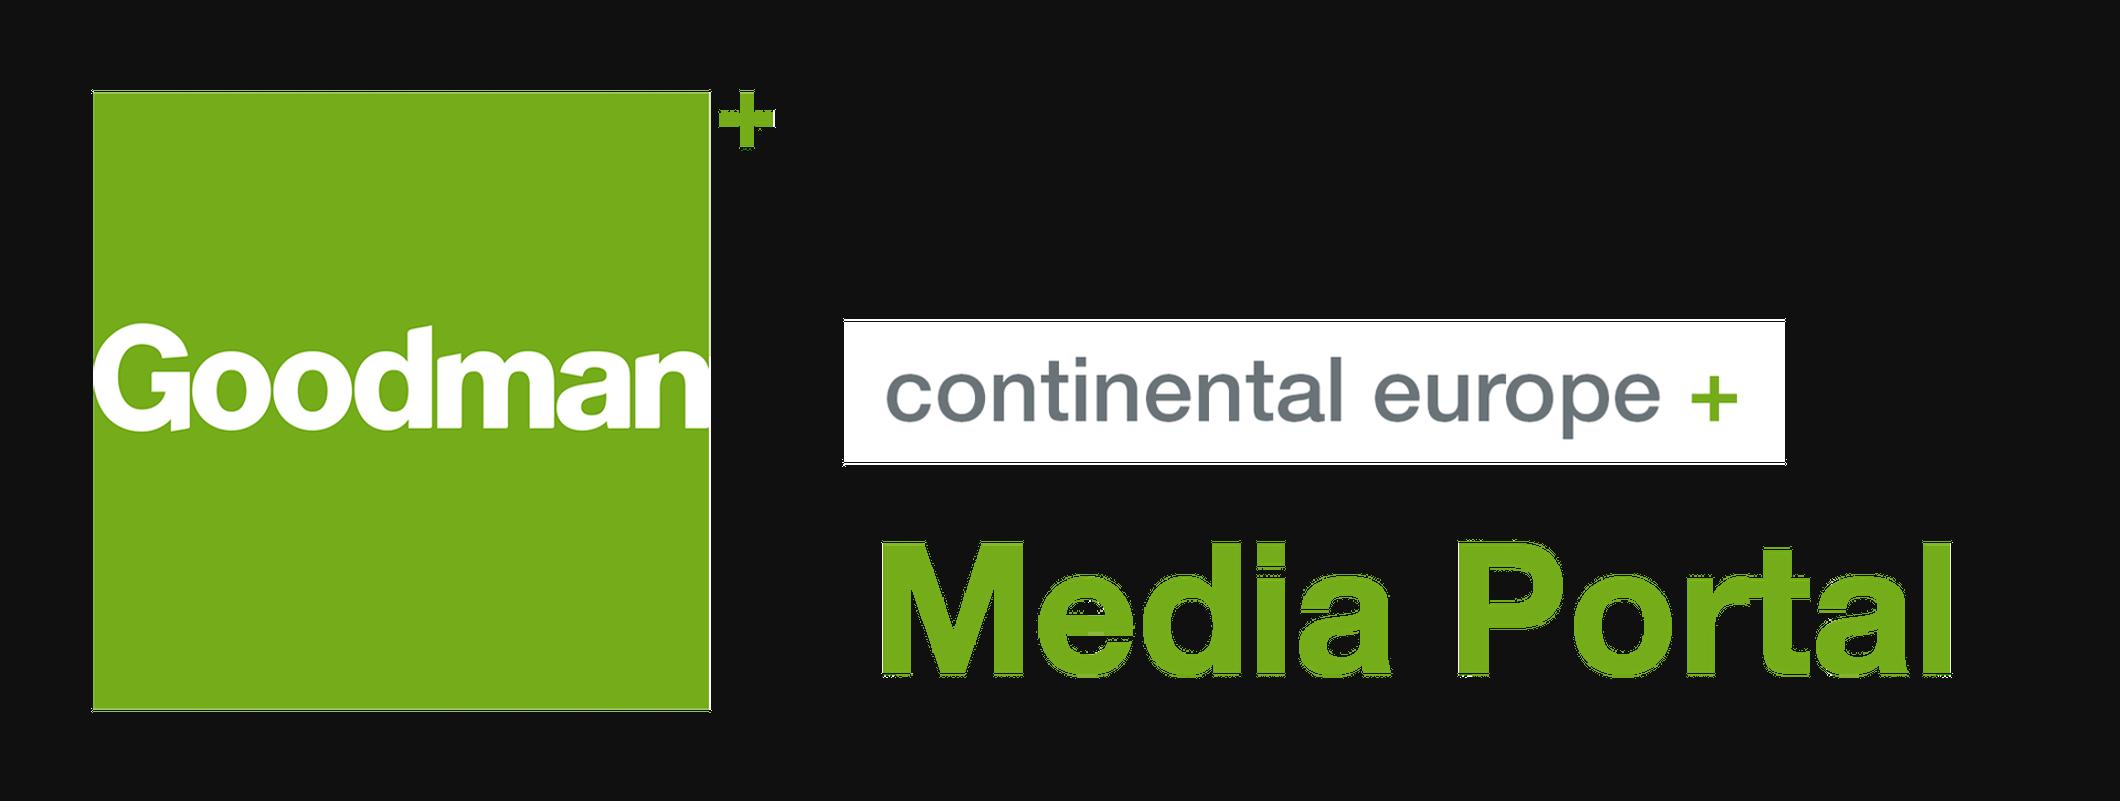 goodman logo. goodman europe media portal goodman logo